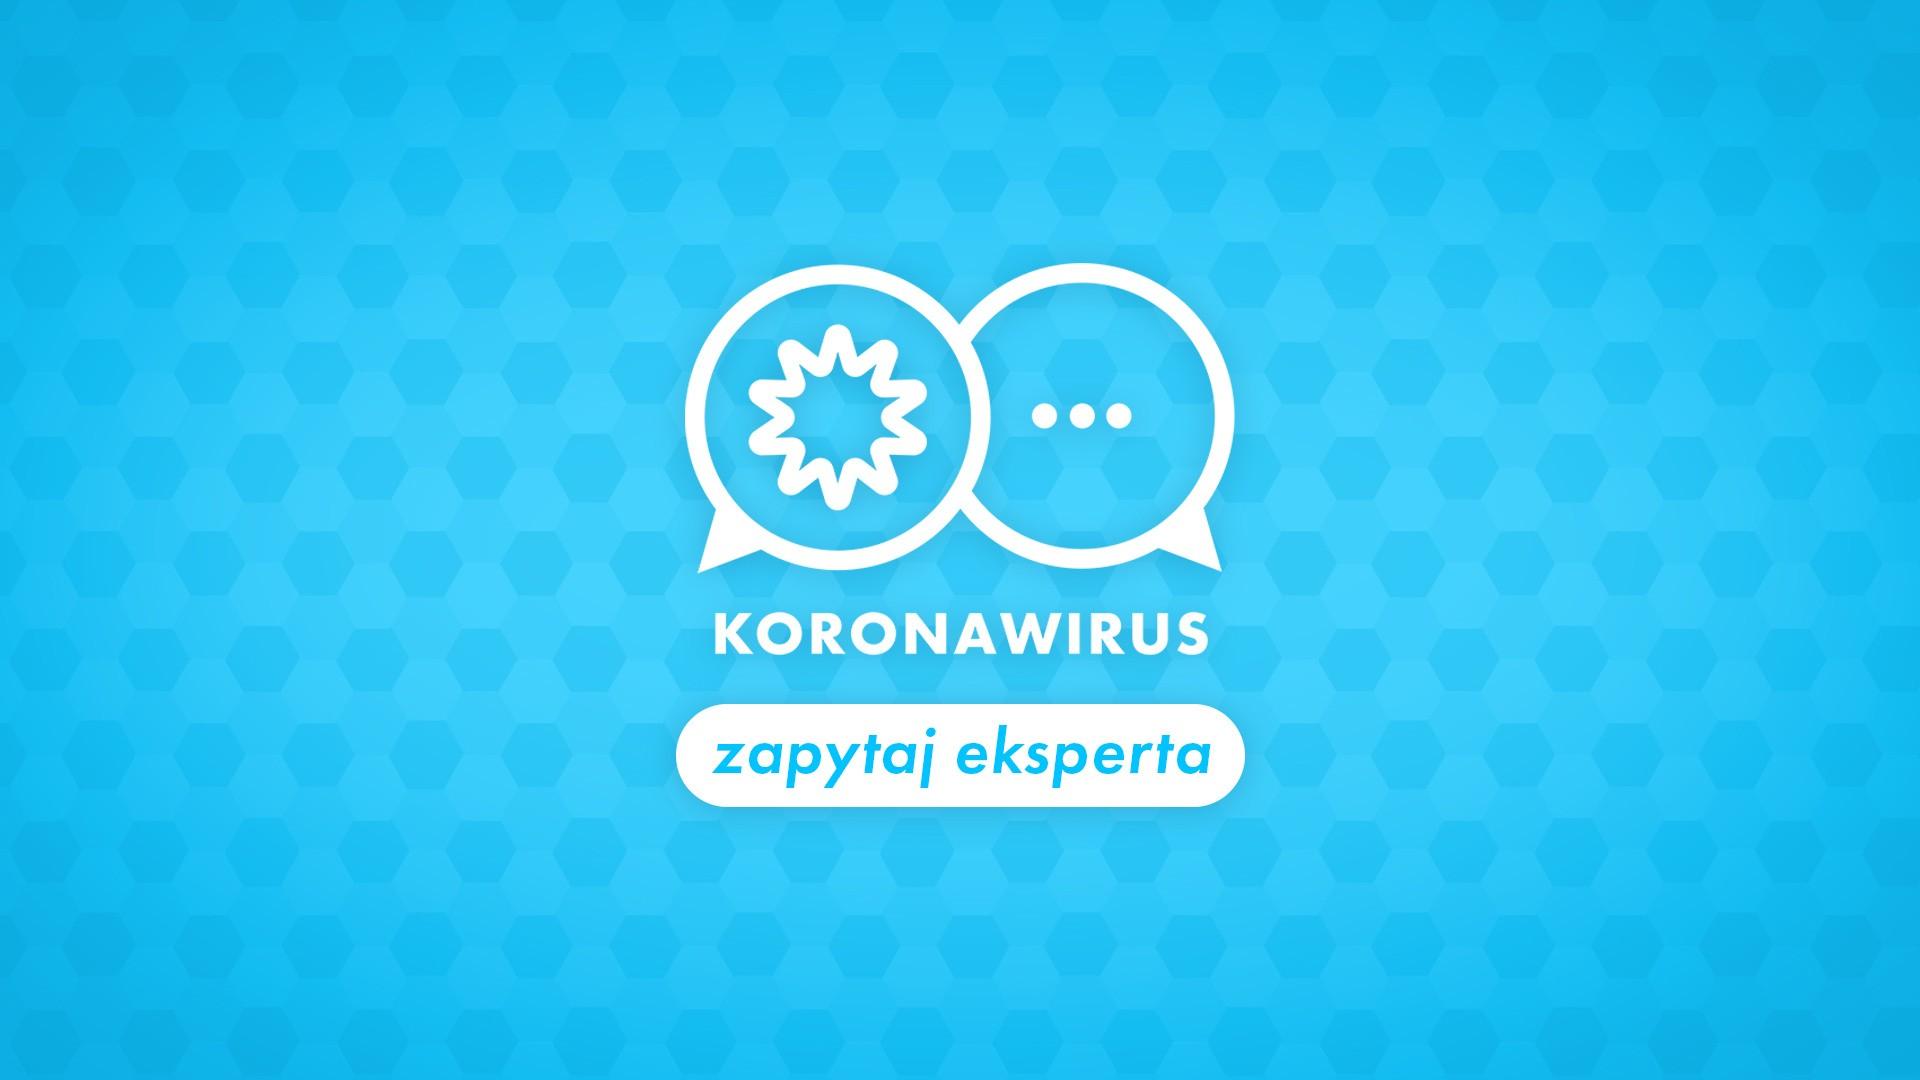 Koronawirus. Zapytaj eksperta